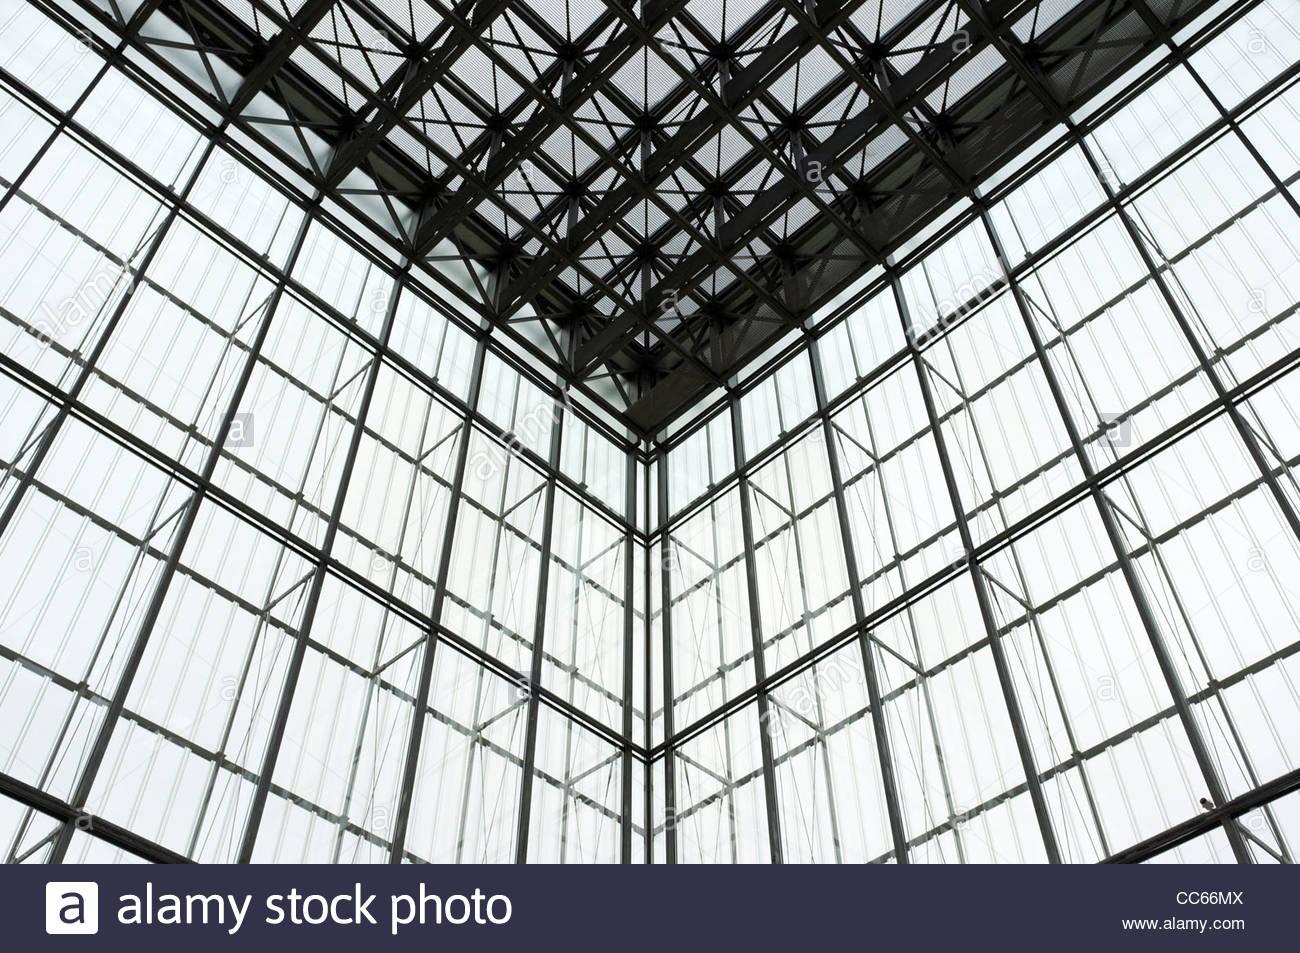 Glass walls architecture at Museum der bildenden Kunste, Leipzig, Saxony, Germany - Stock Image